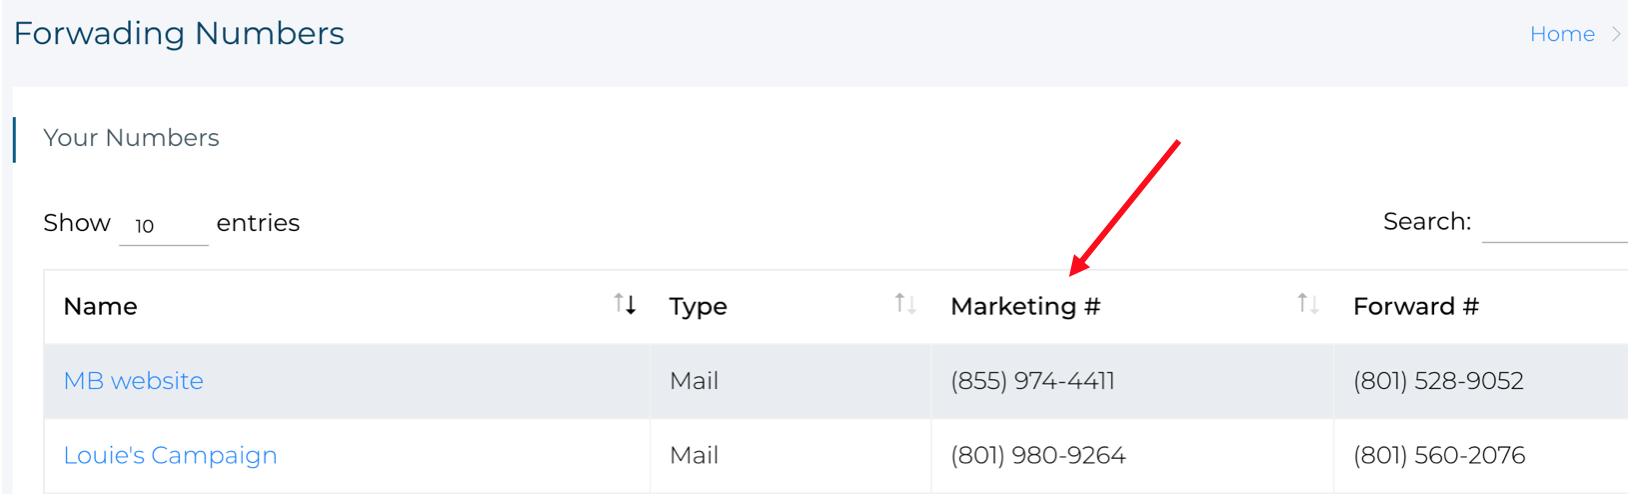 Marketing Number